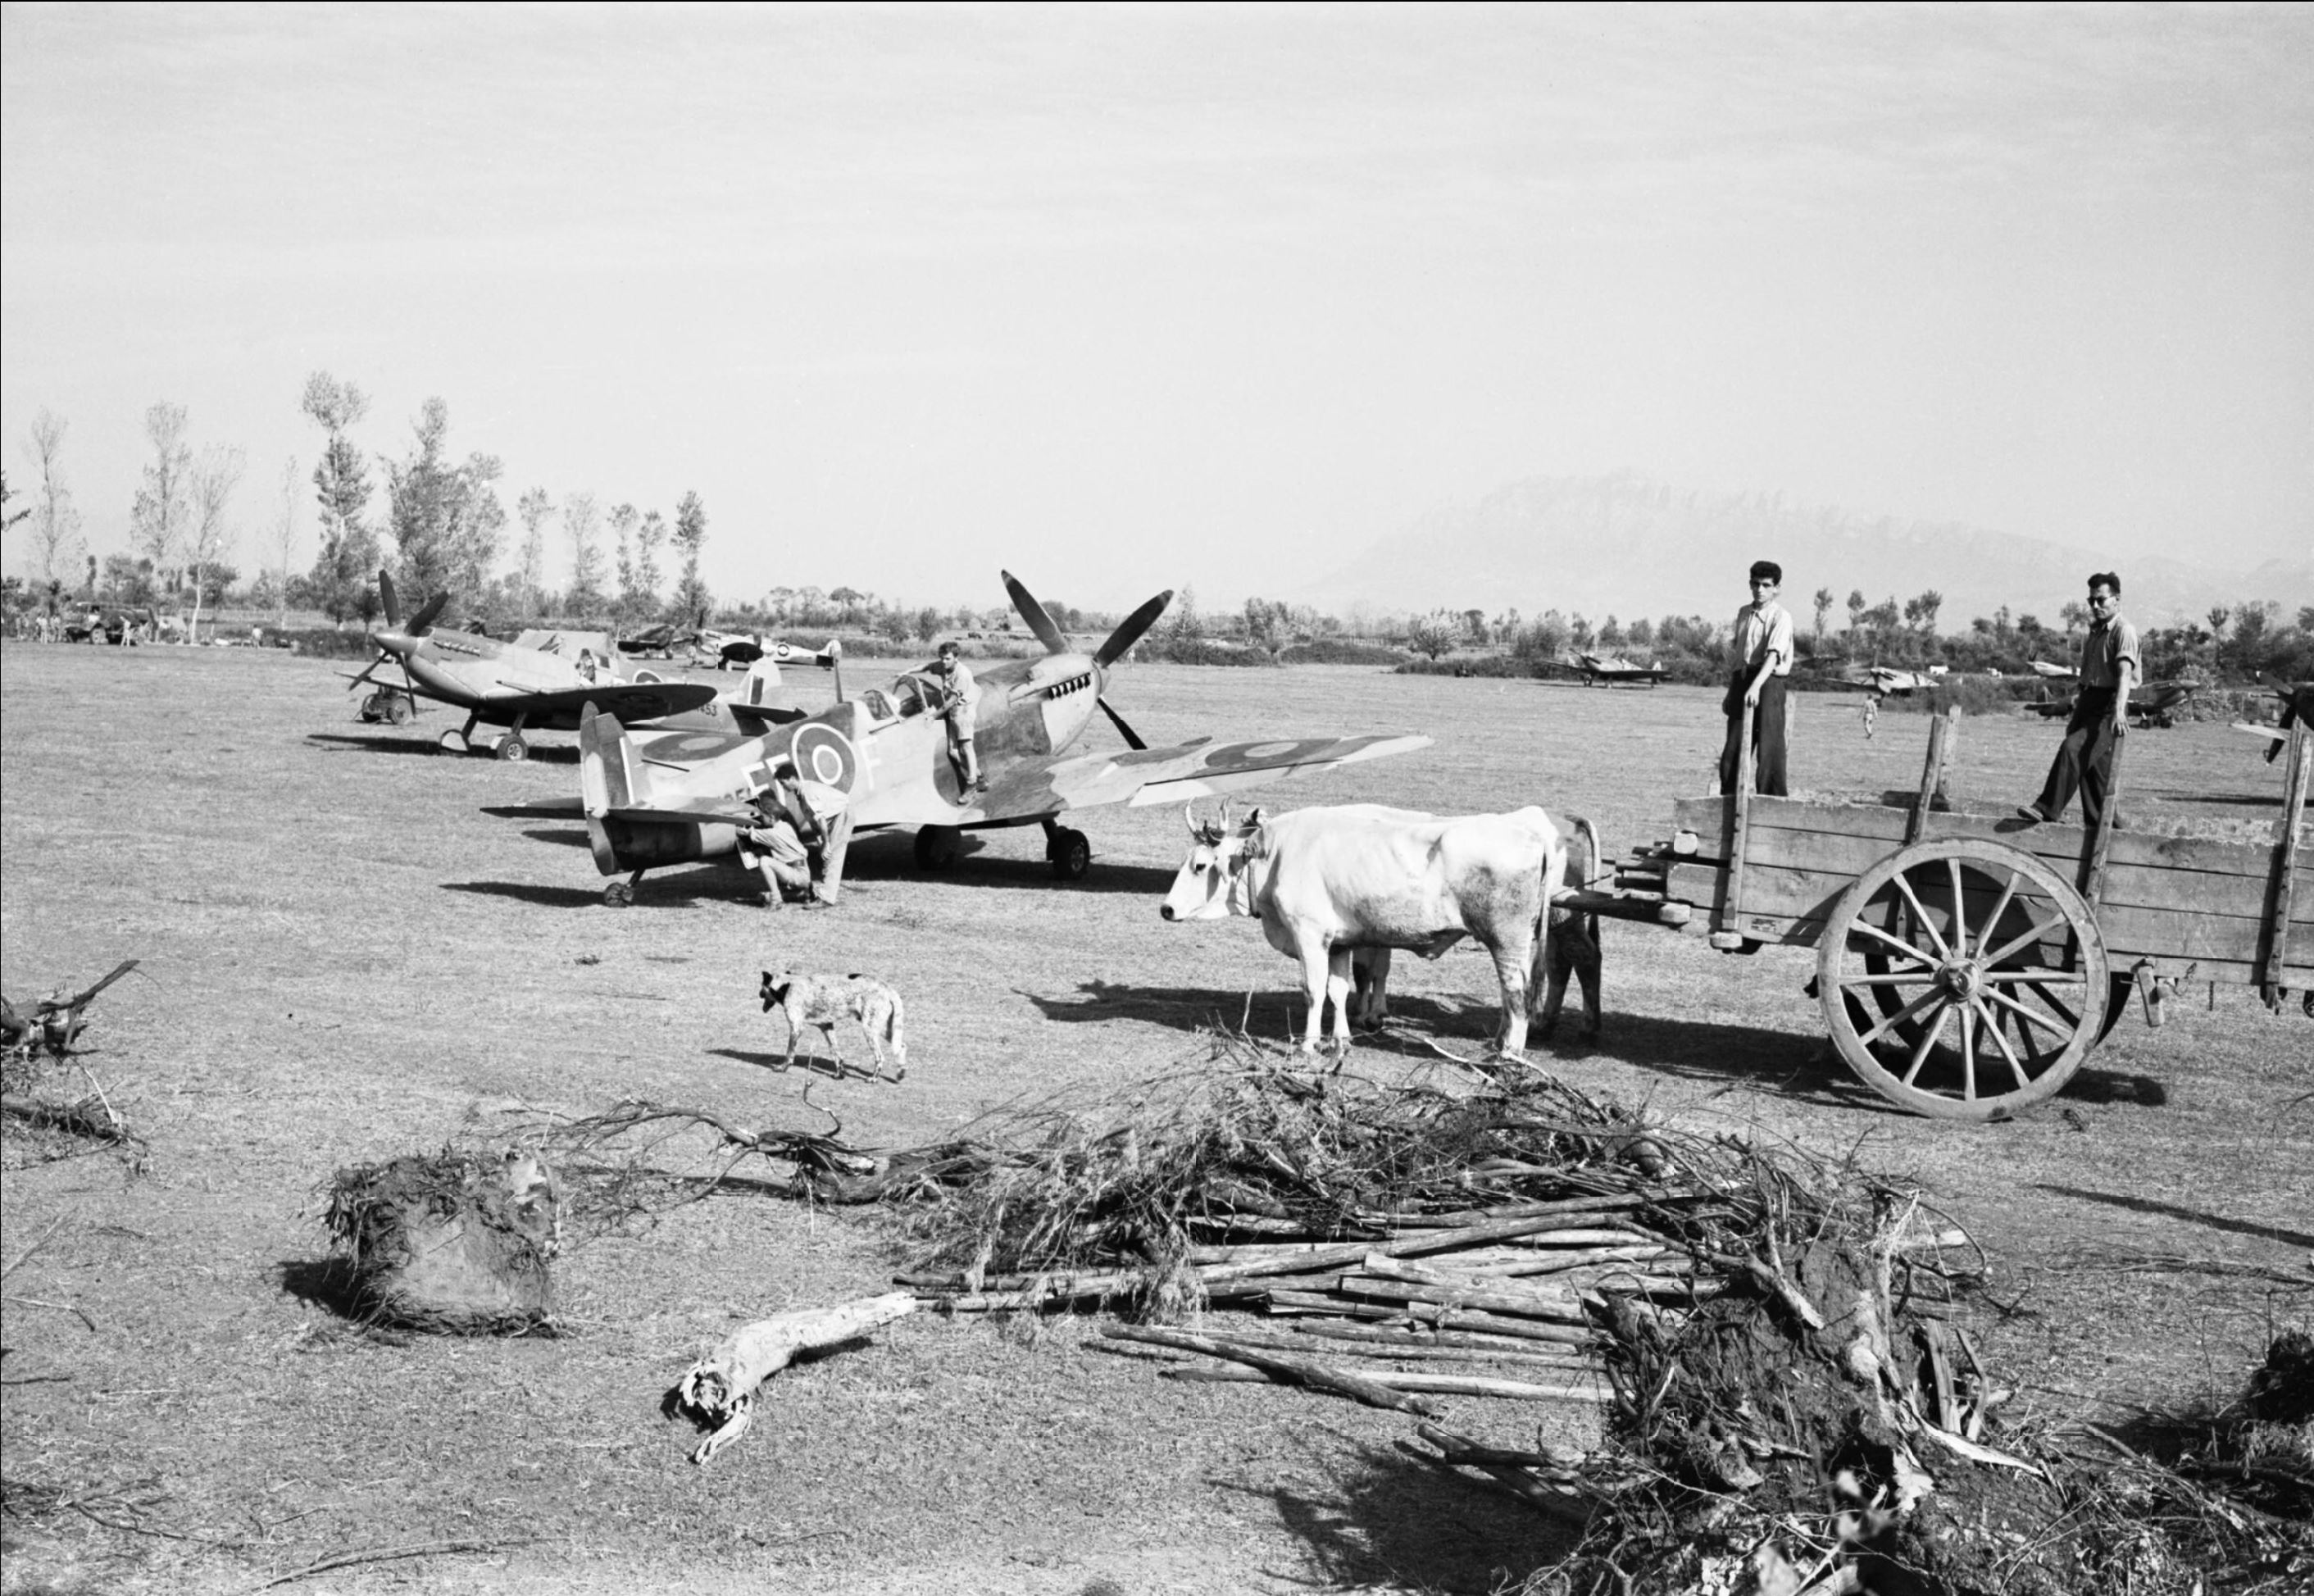 Spitfire MkIX RAF 232Sqn EFF at Serretelle nr Salerno Italy 3 Oct 1943 IWM CNA1642